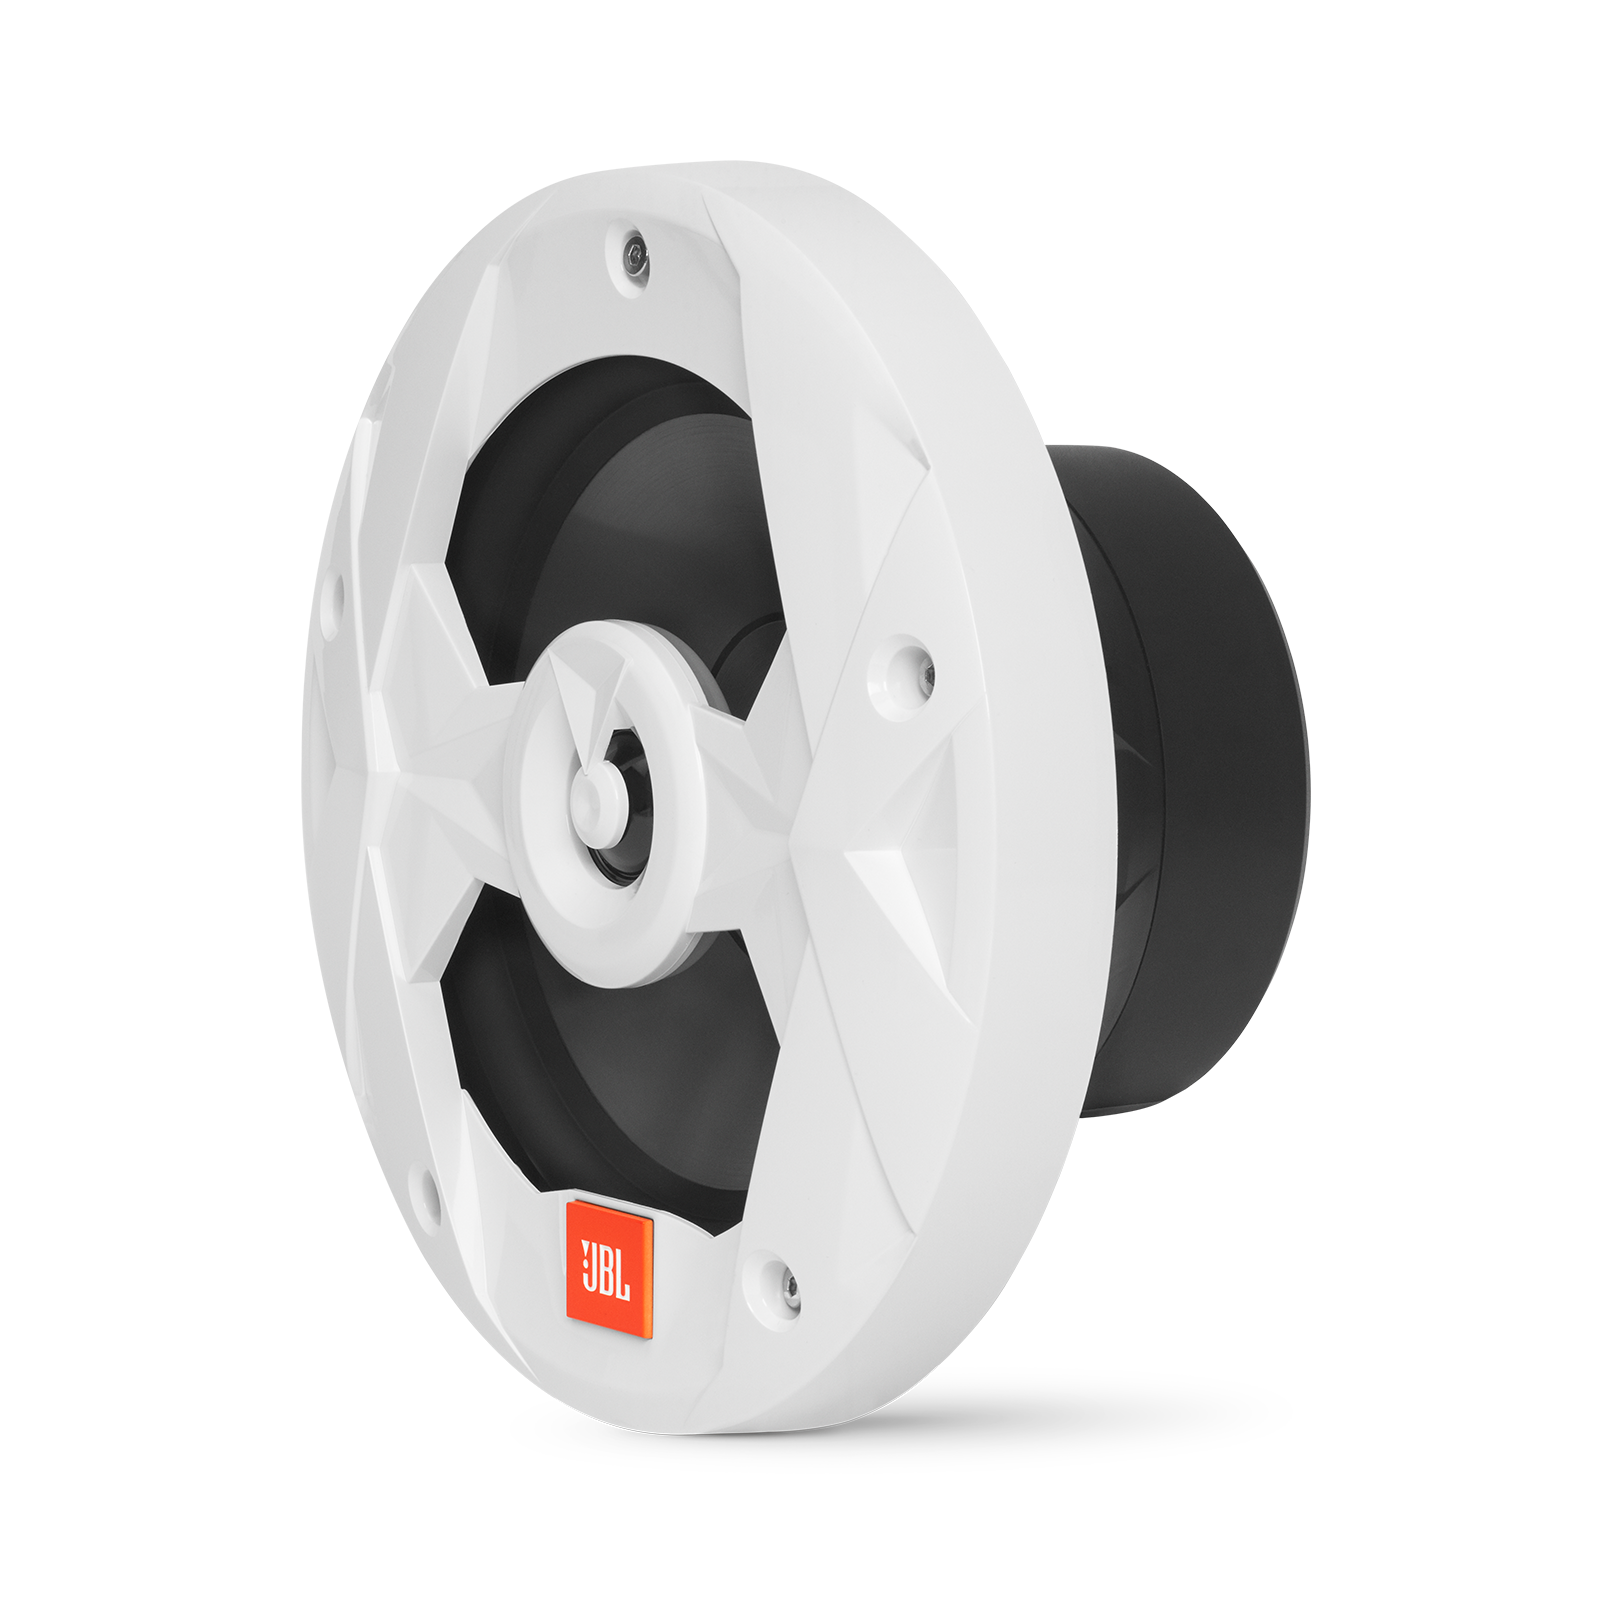 "Club Marine MS8LW - White Gloss - Club Marine MS8LW—8"" (200mm) two-way marine audio multi-element speaker with RGB lighting – White - Left"